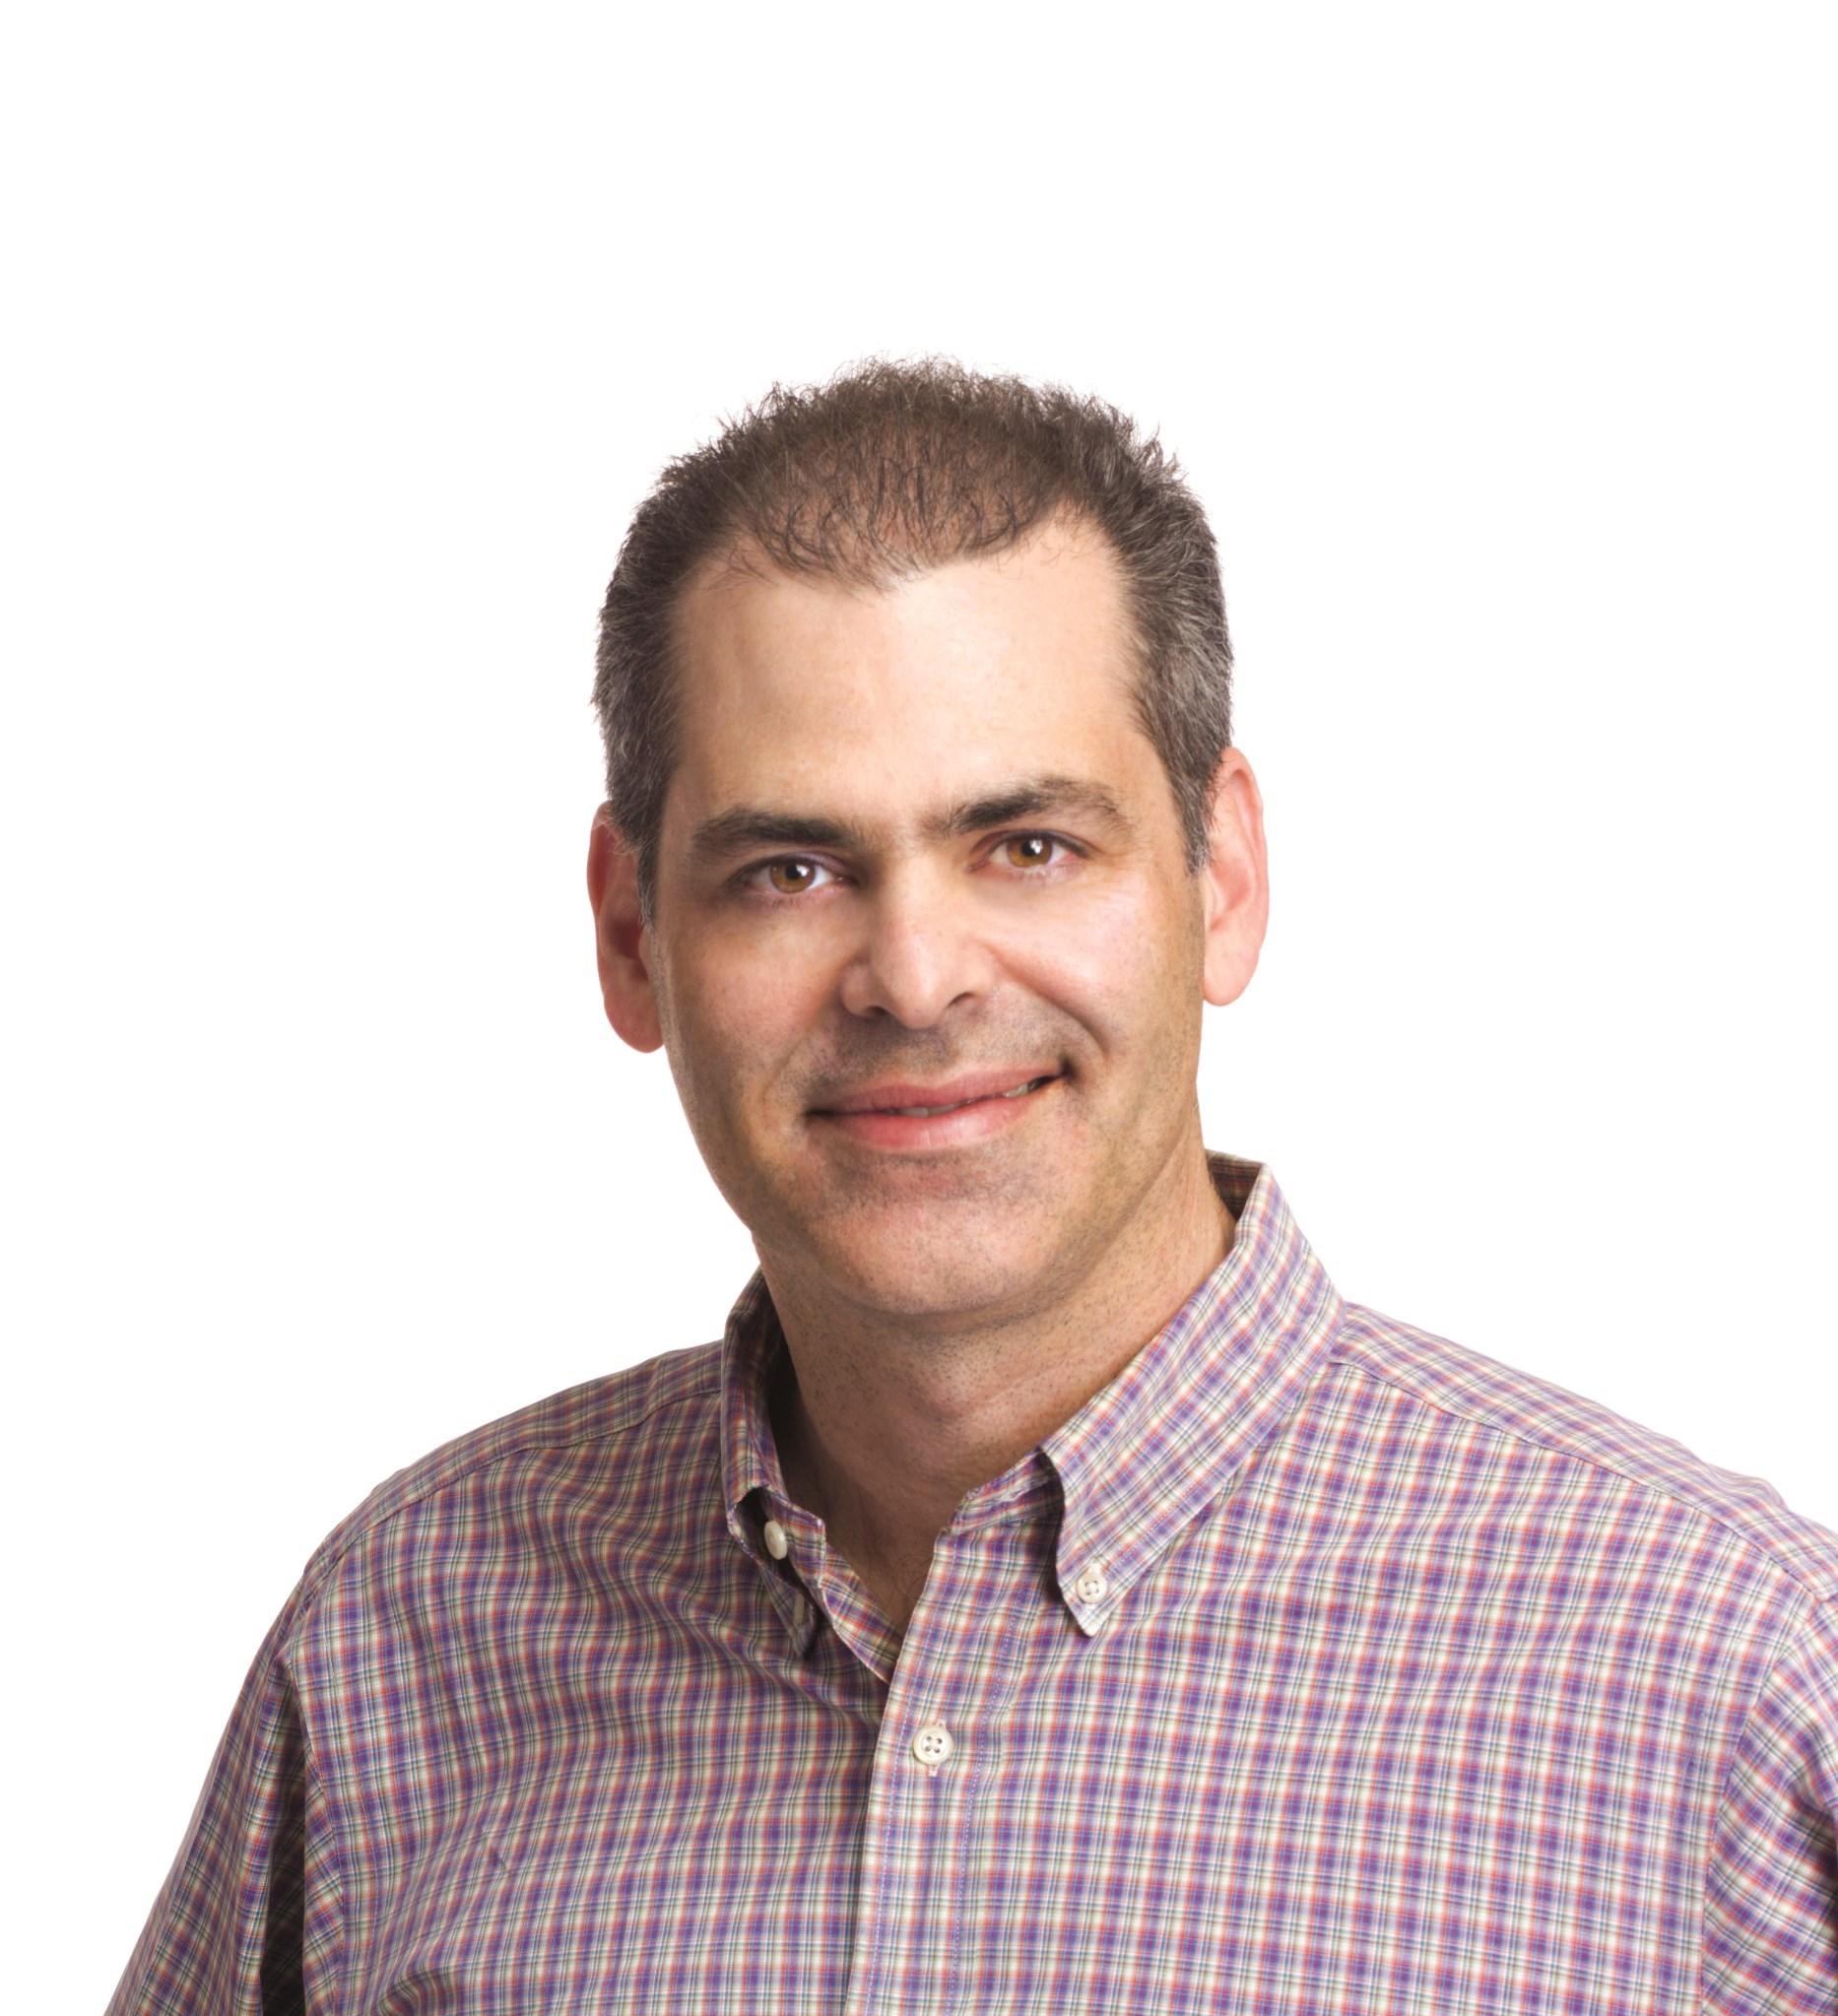 Jeff Perino, creative director at Triple Threat Communications